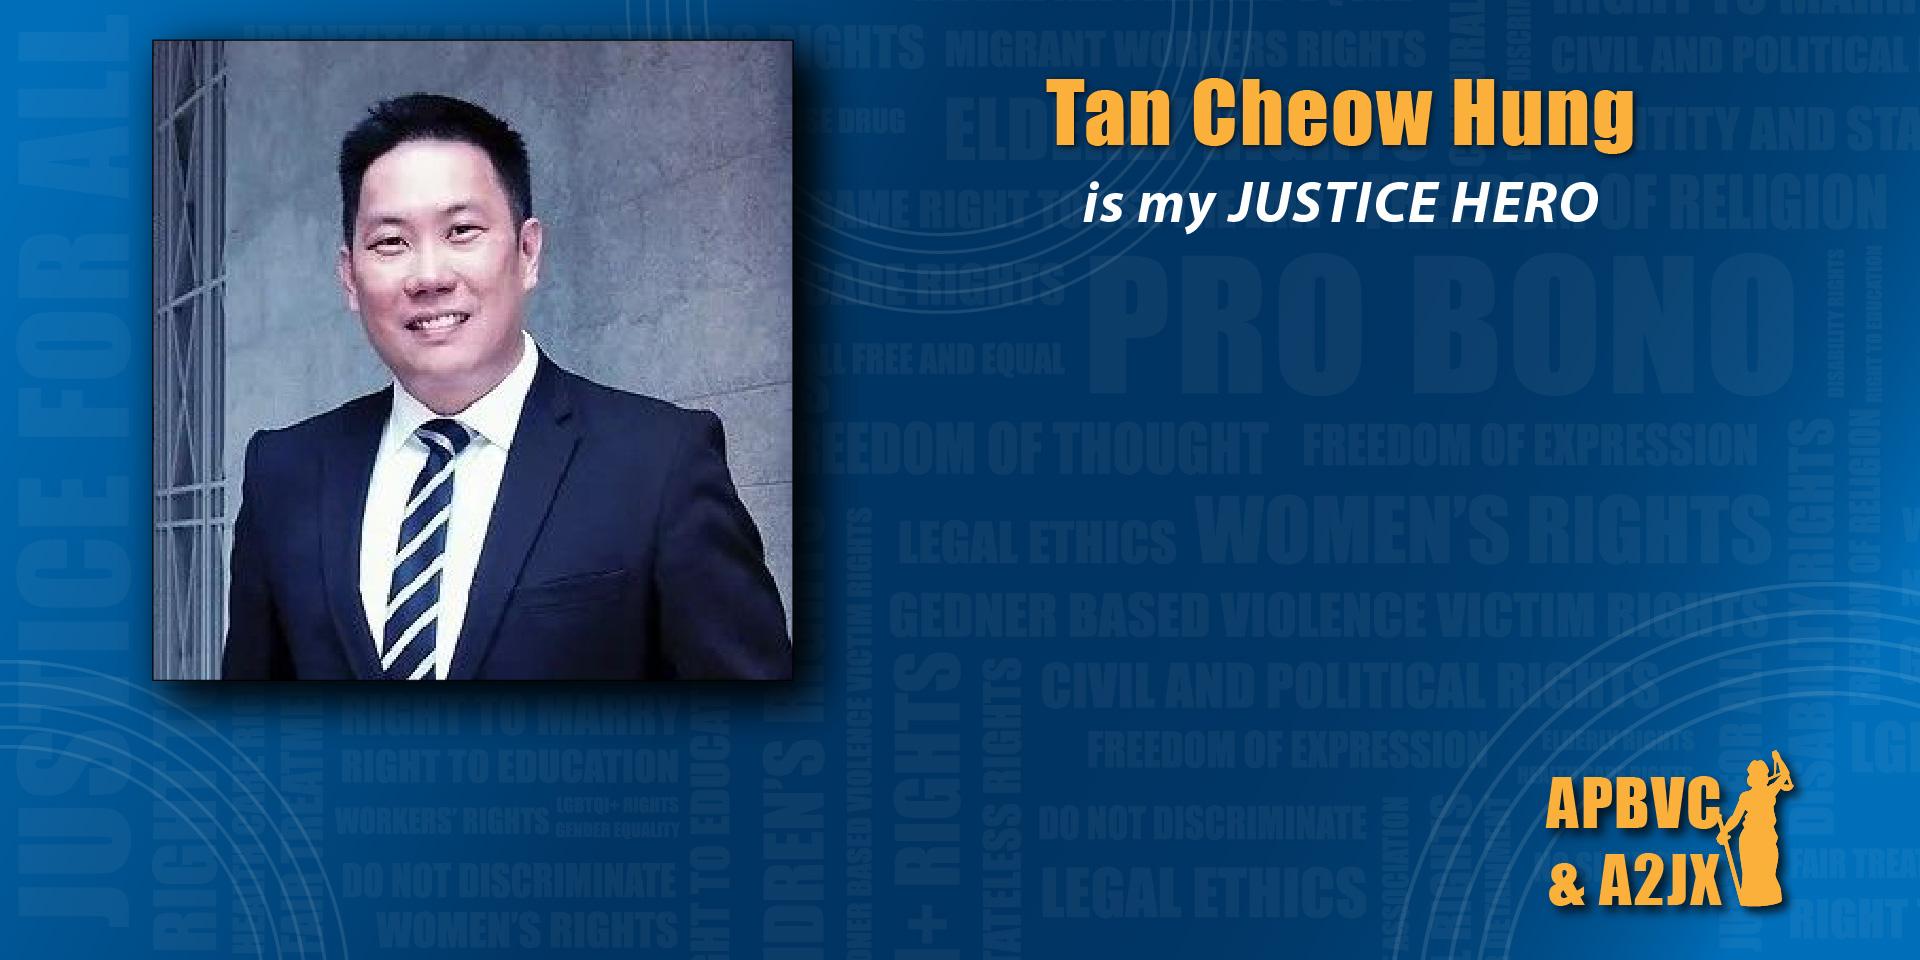 Tan Cheow Hung